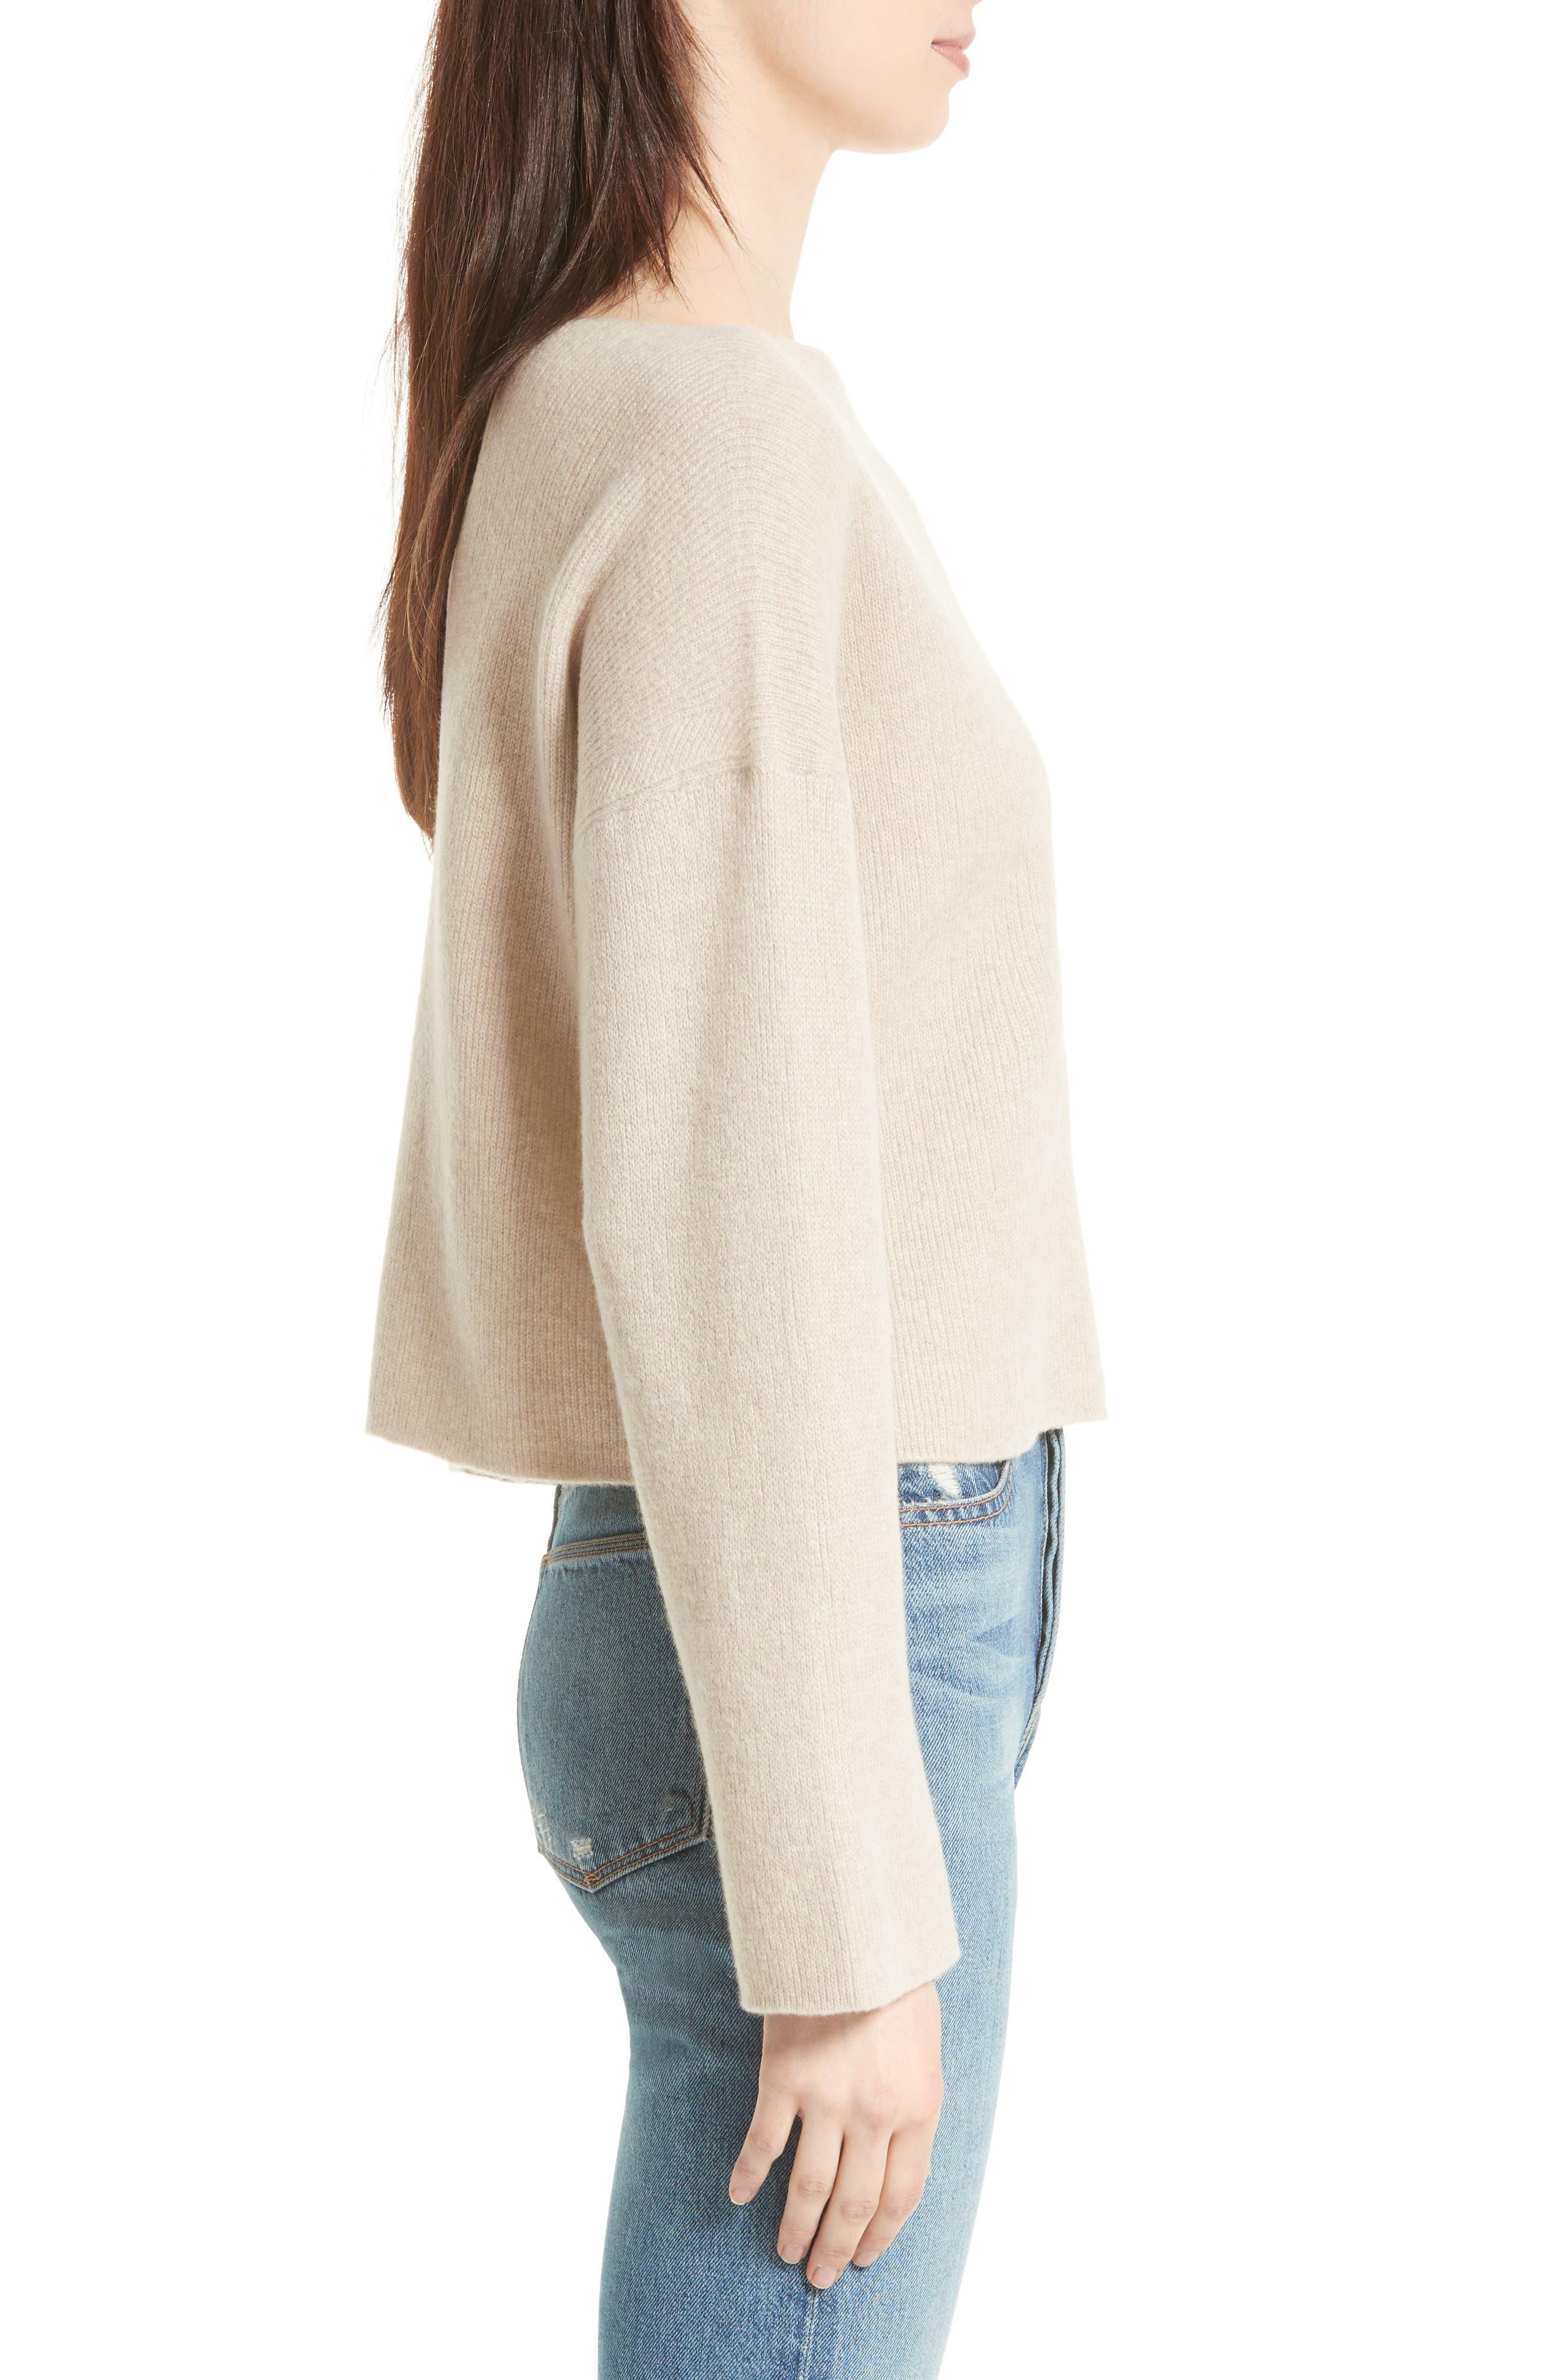 VINCE,                             Boxy Cashmere Sweater,                             Alternate thumbnail 3, color,                             233